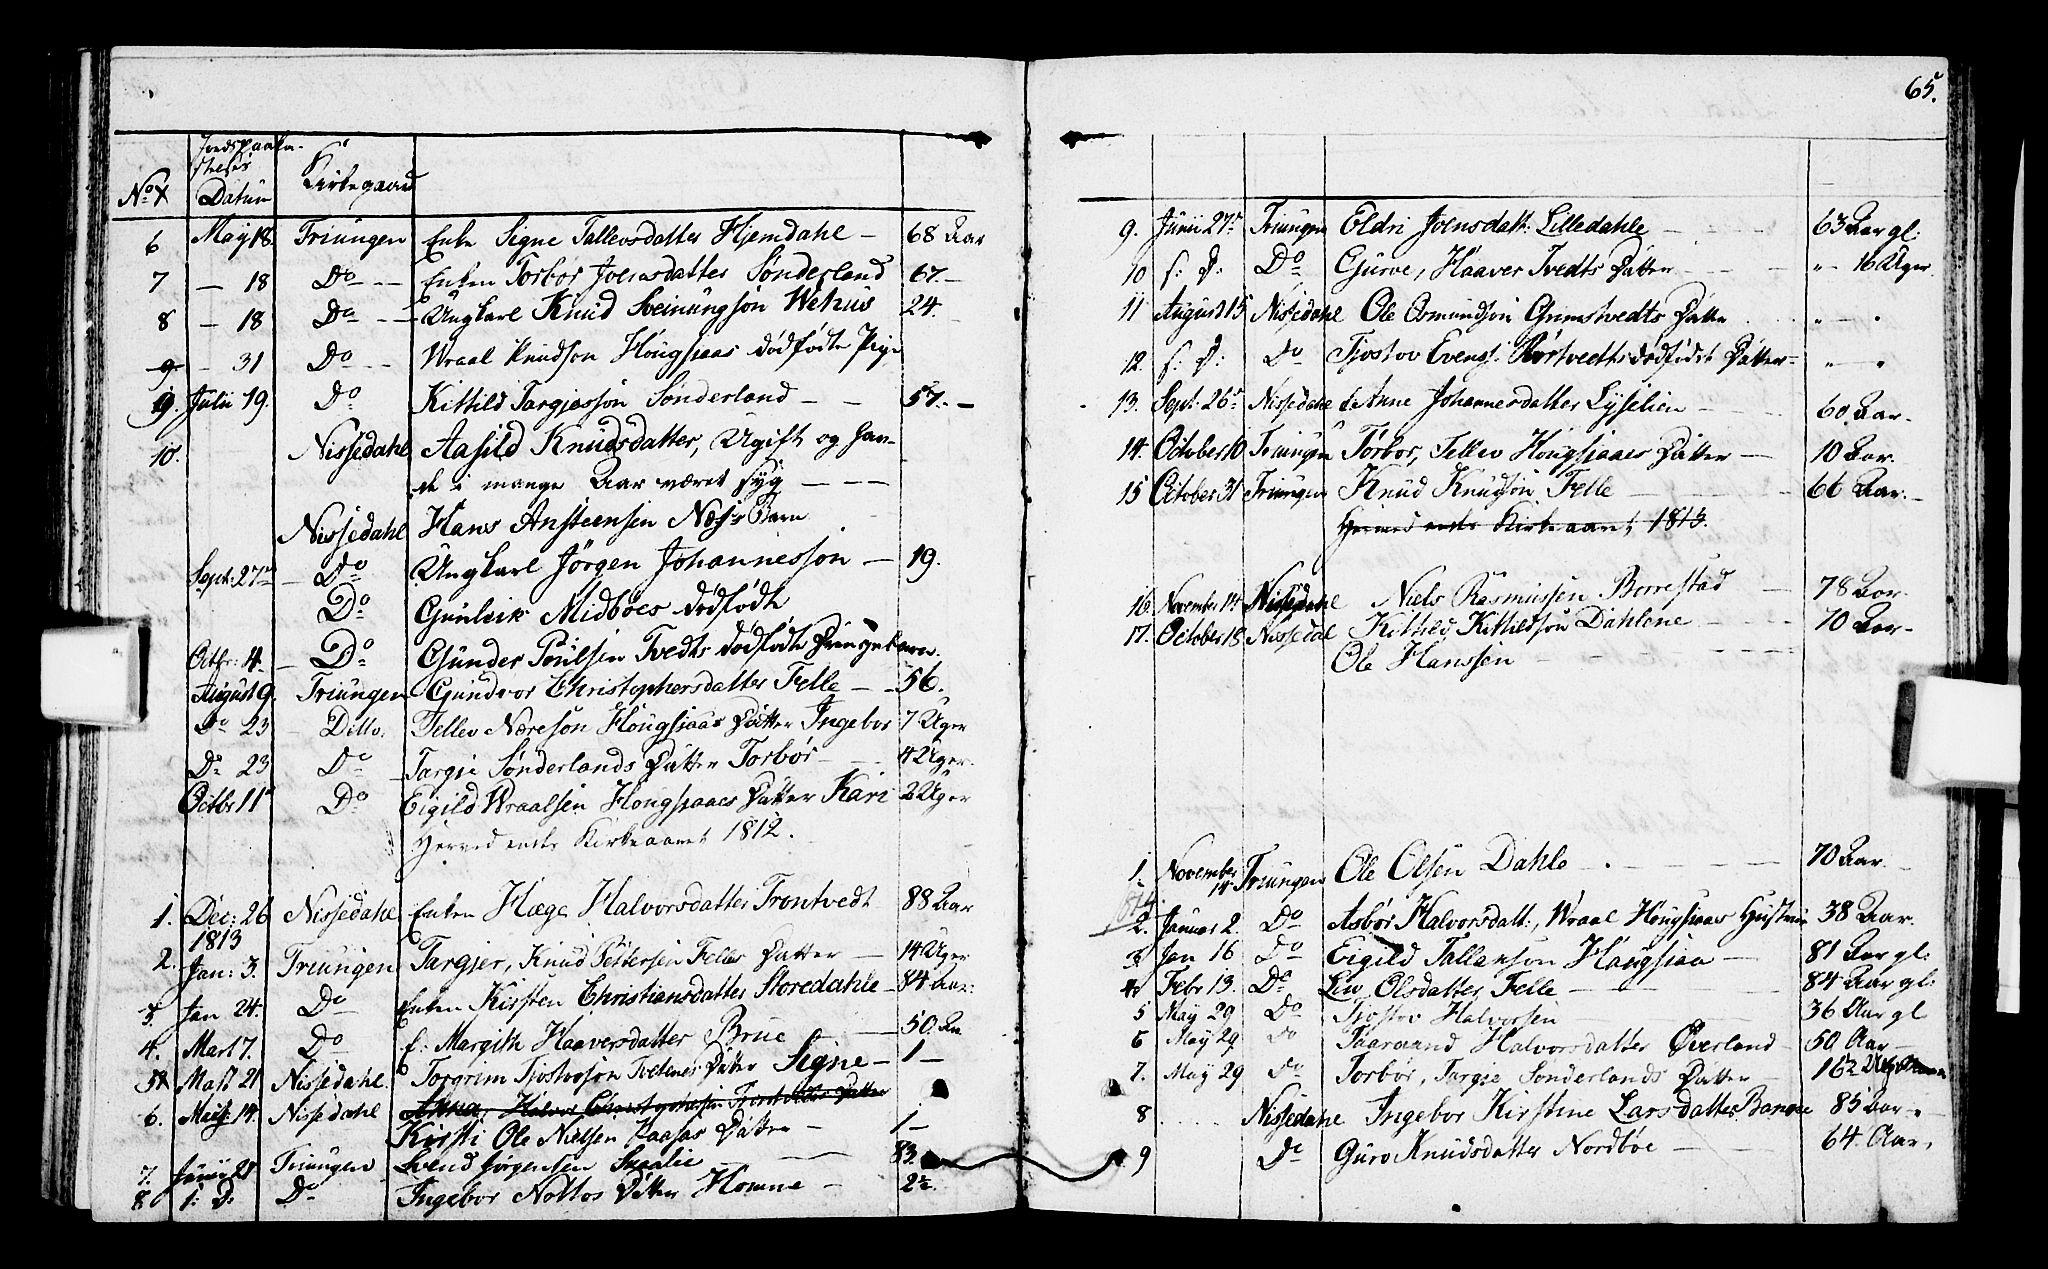 SAKO, Nissedal kirkebøker, F/Fa/L0001: Ministerialbok nr. I 1, 1811-1814, s. 65